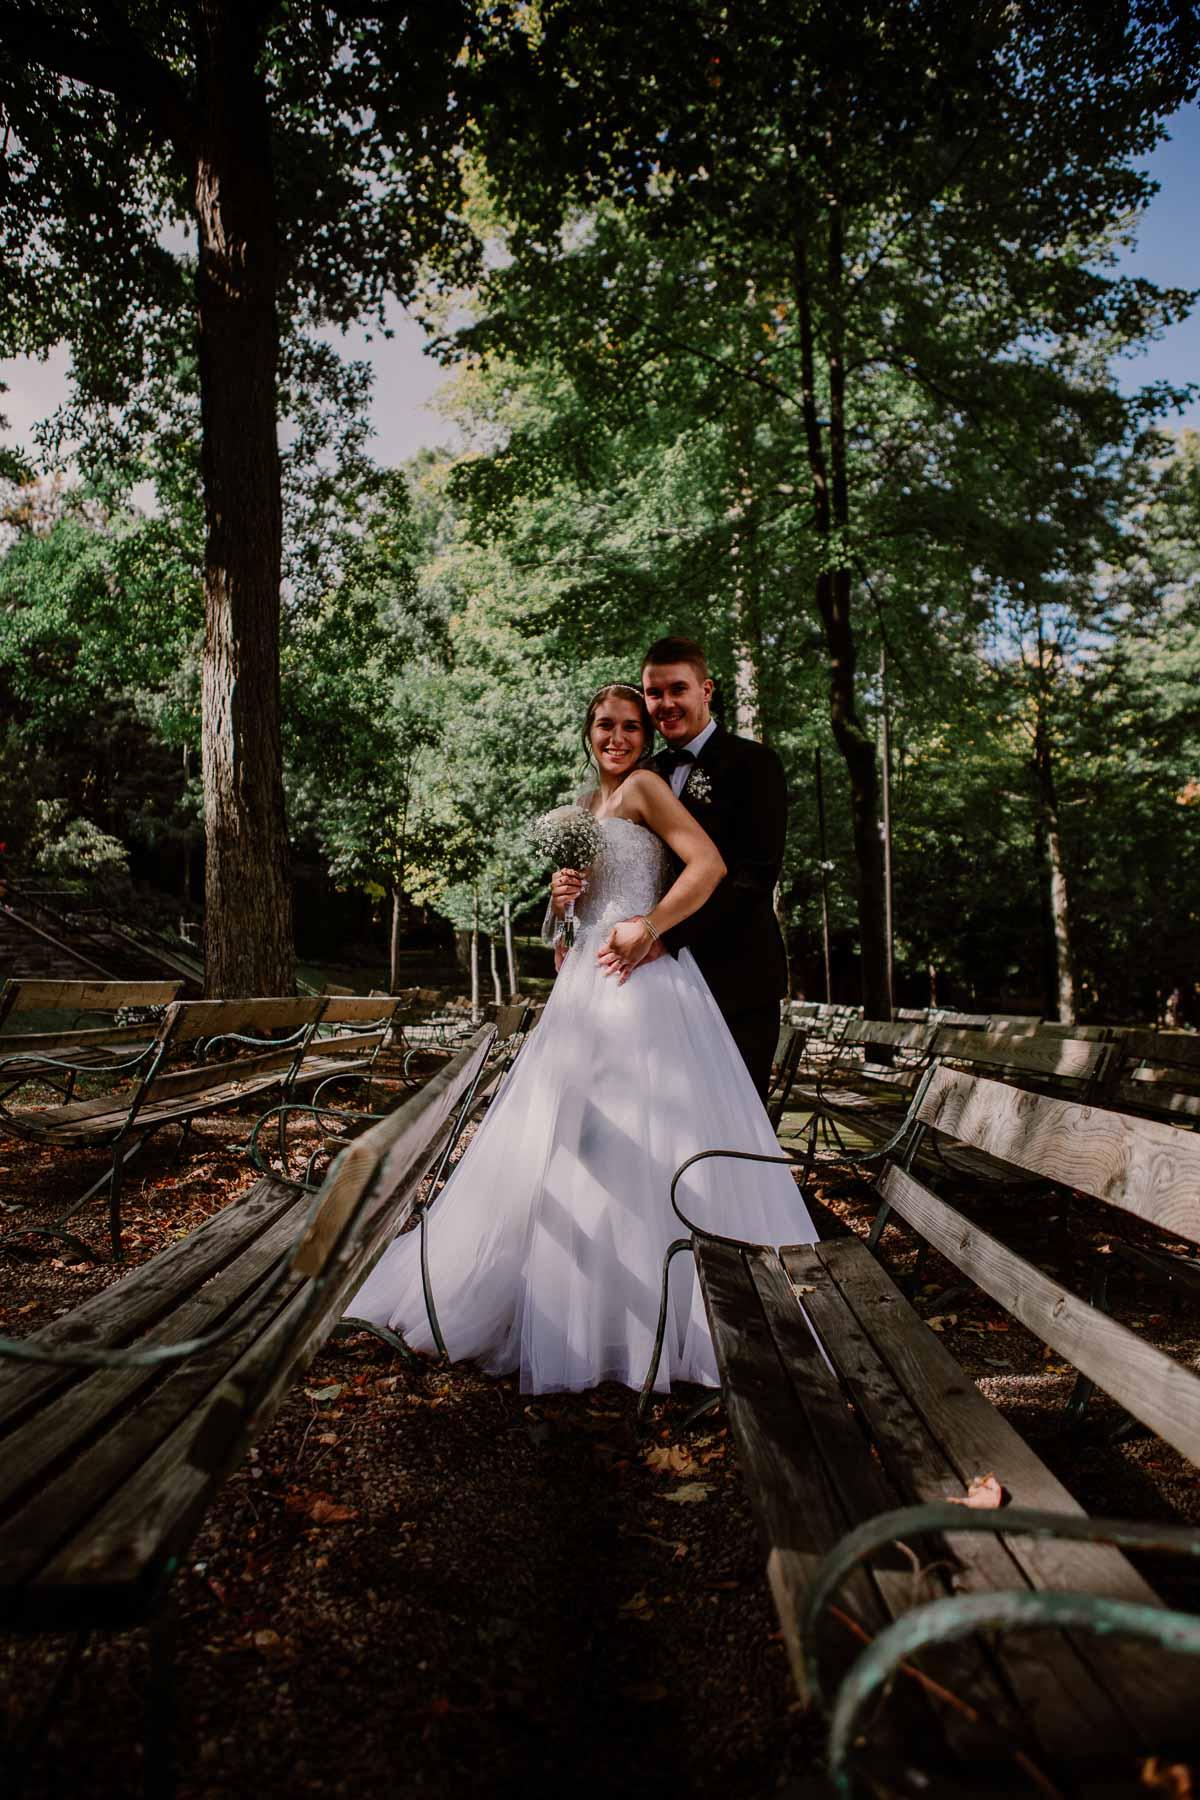 mariage intime au québec en automne debout